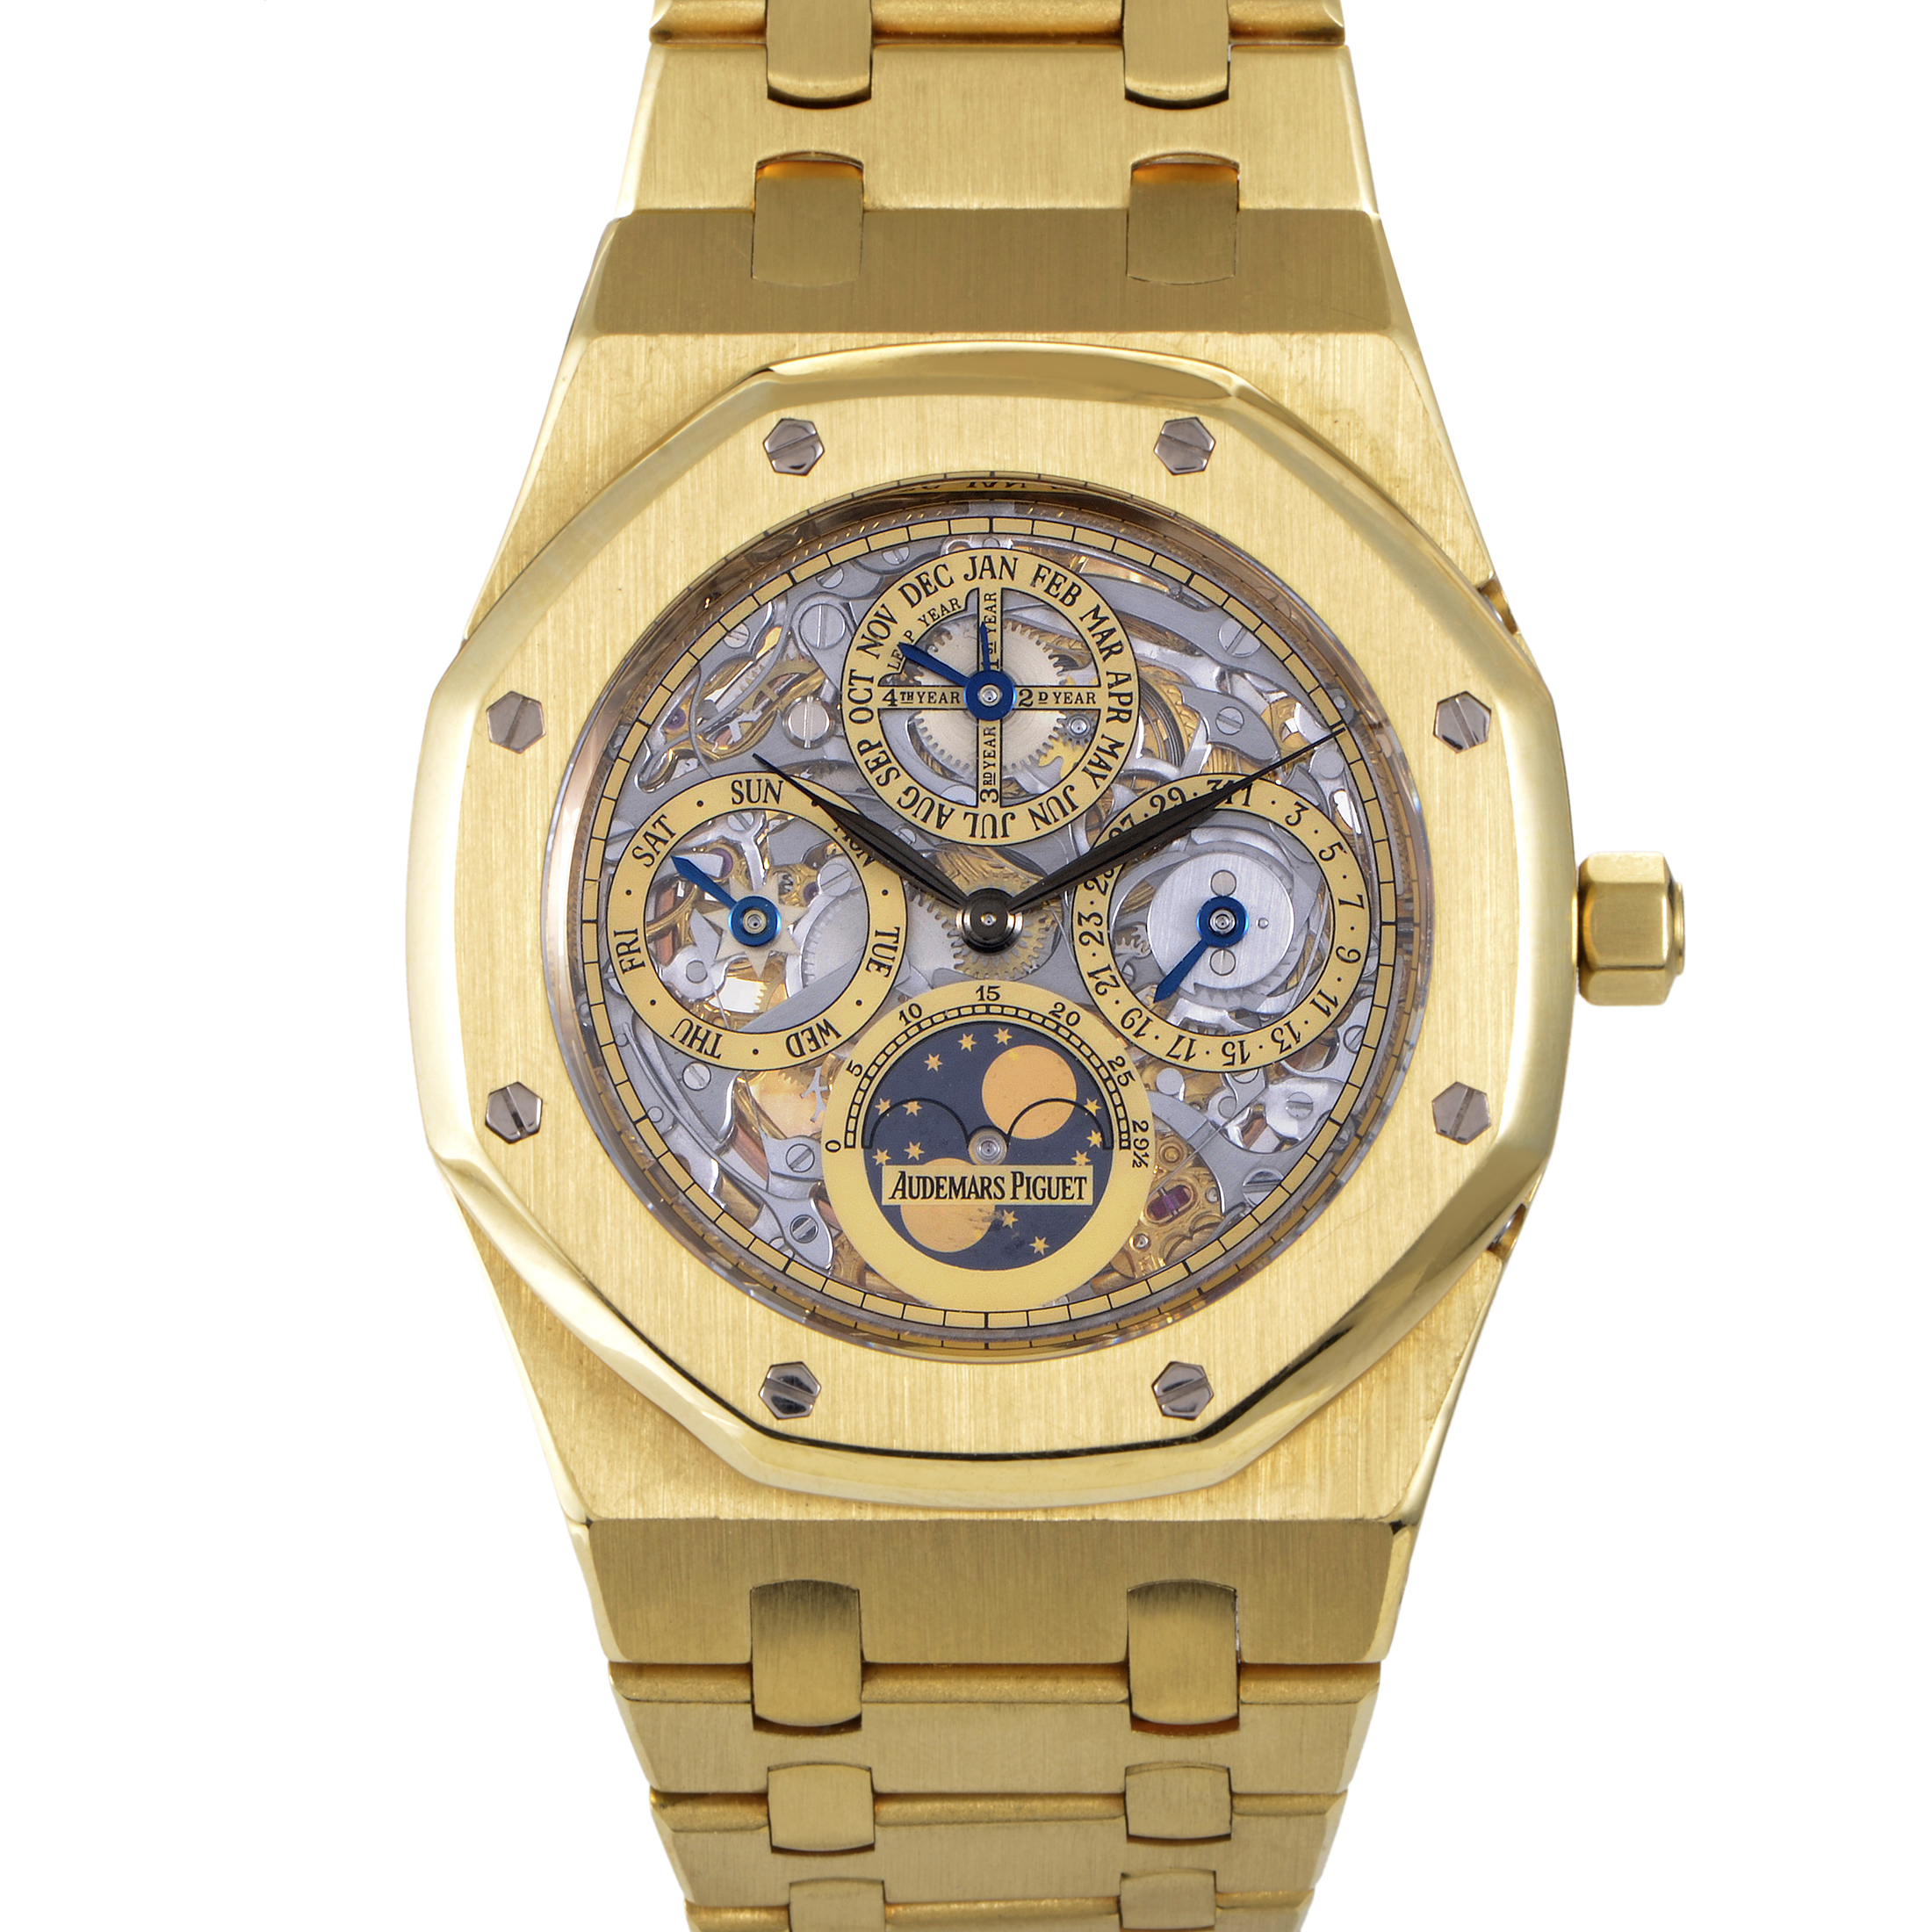 Royal Oak Perpetual Calendar Skeleton Watch 25829BA.OO.0944BA.01